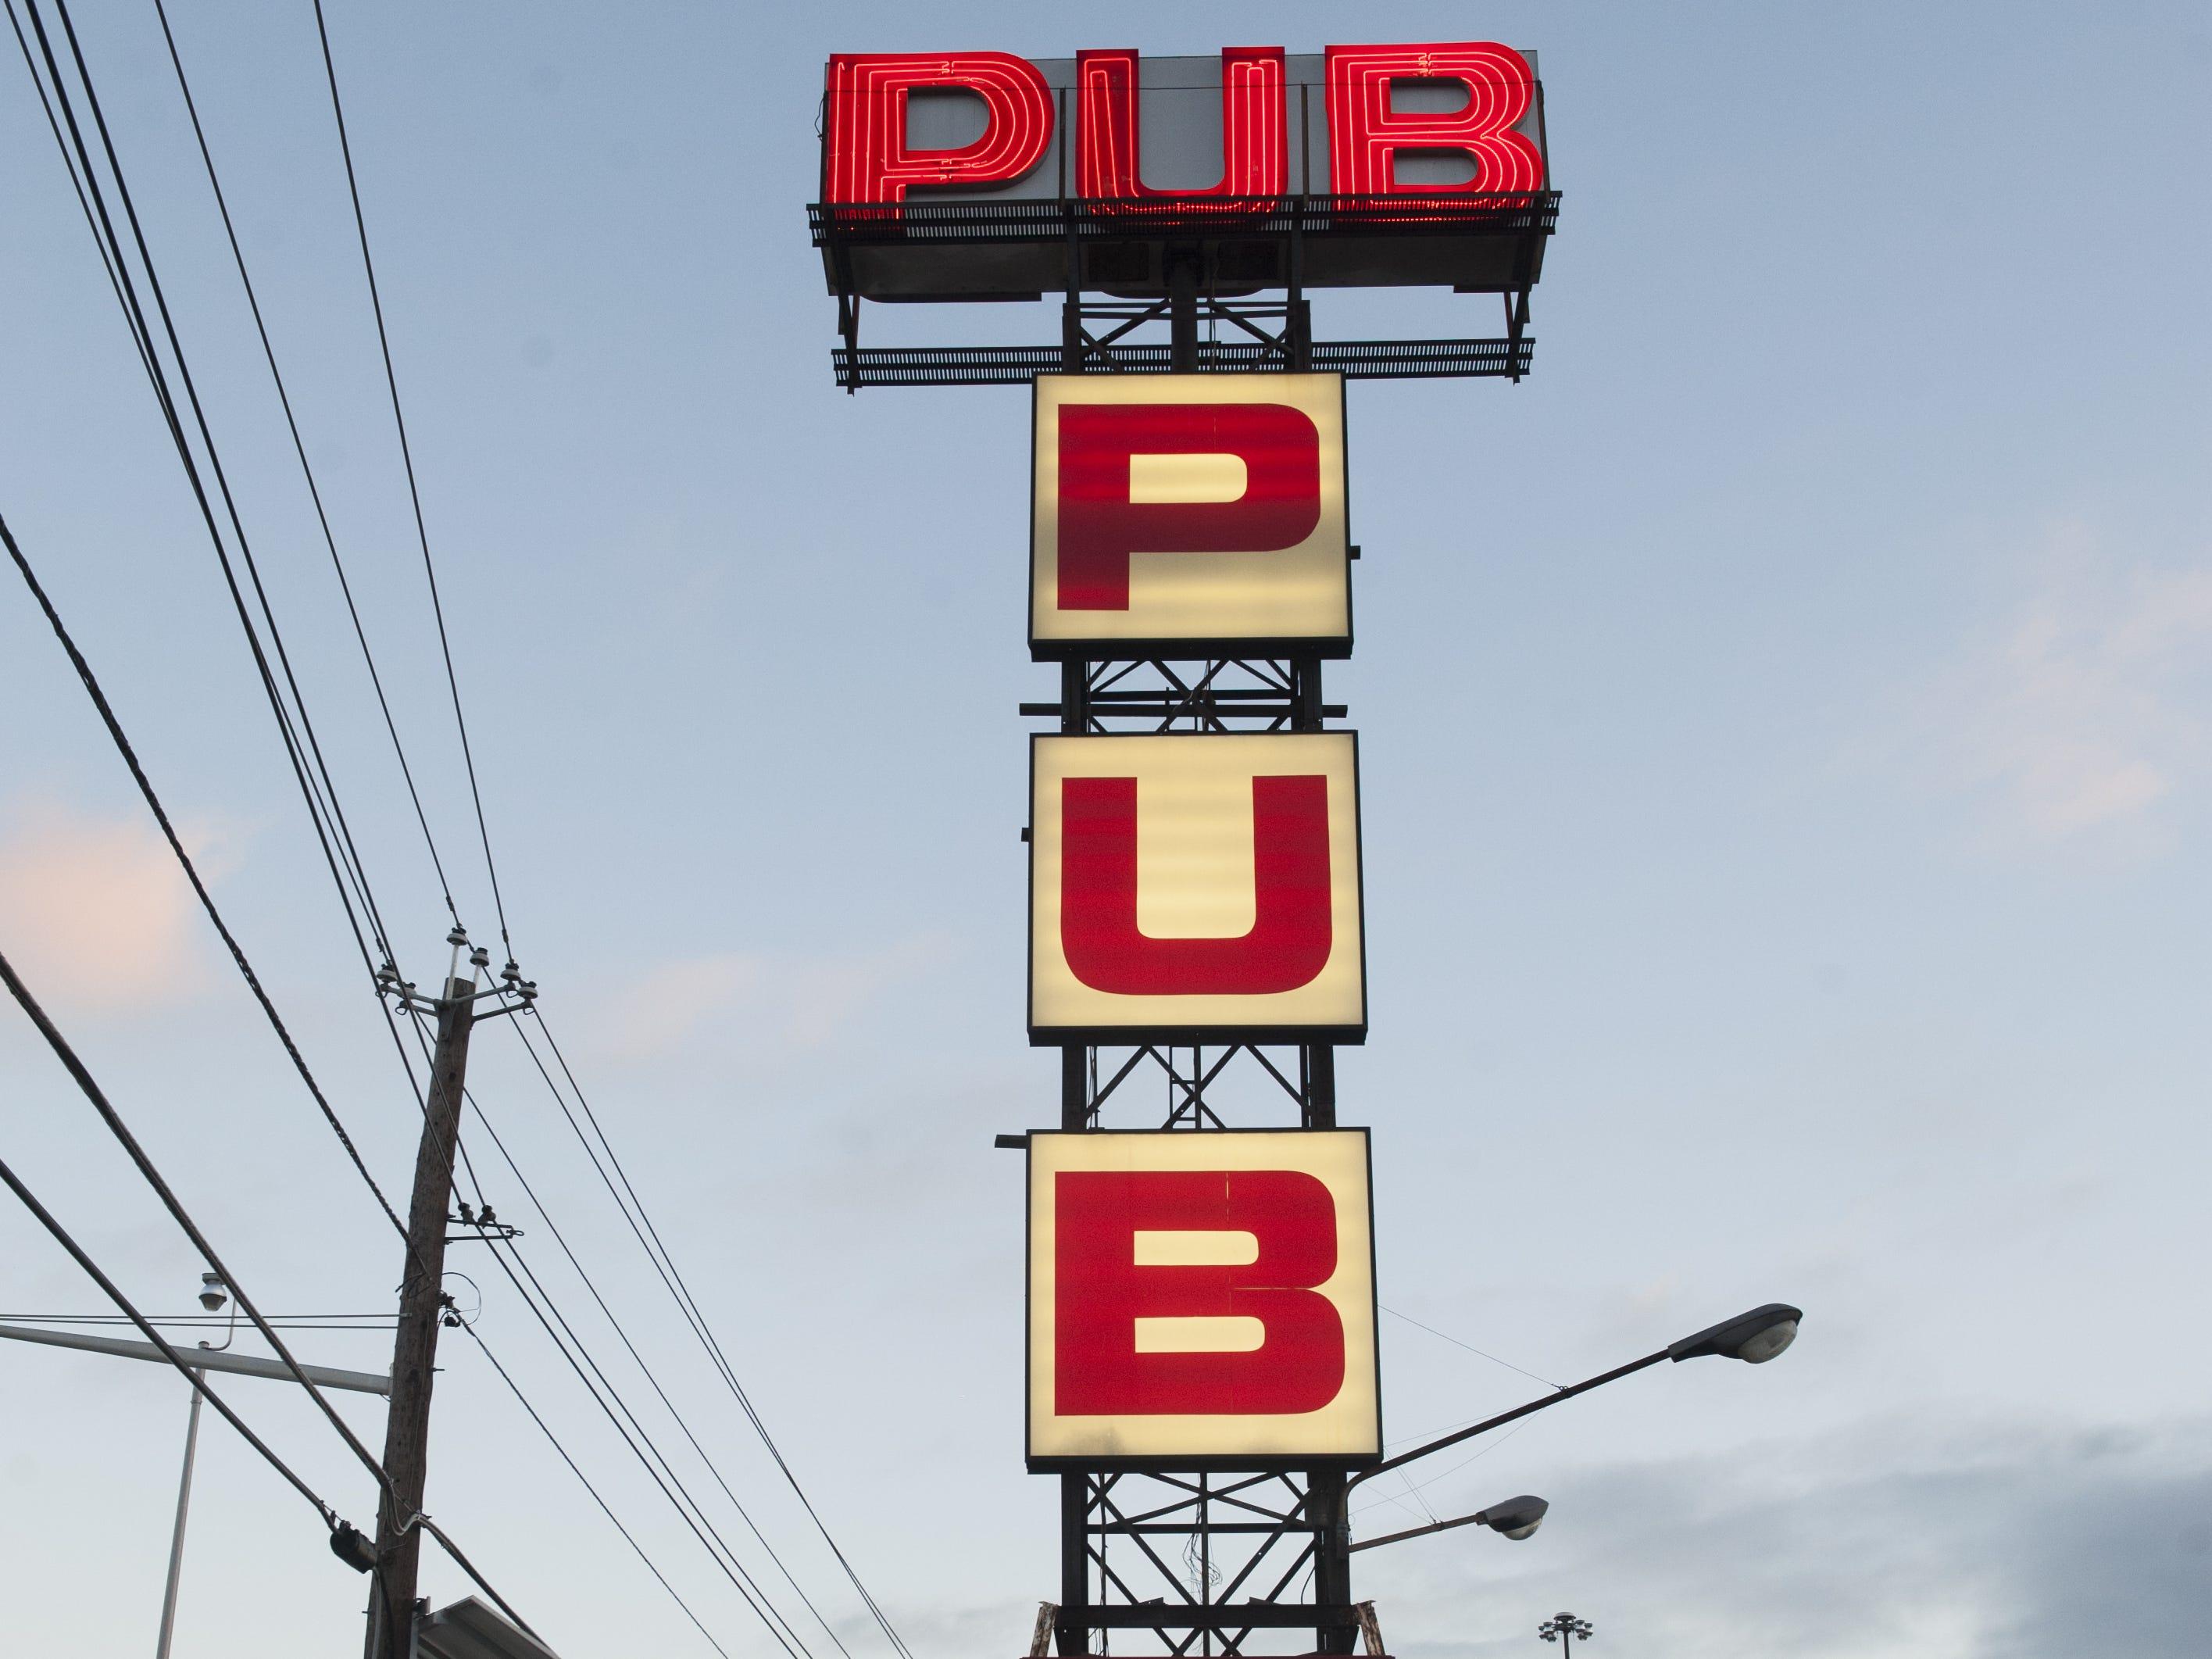 The Pub sign in Pennsauken.